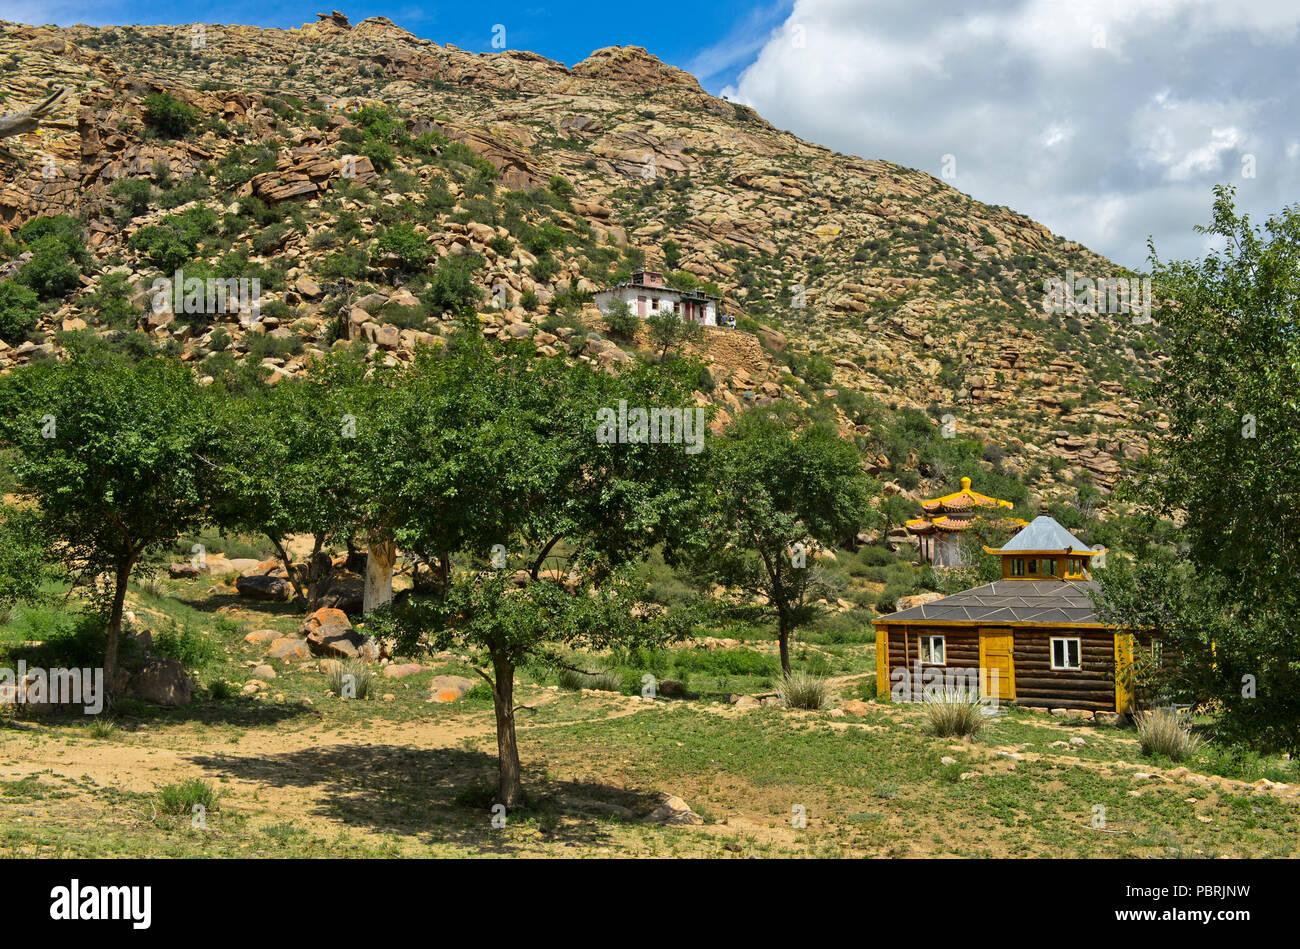 Temple, Erdene Khamba Monastery, Khugnu Khan Mountains, Khögnö Khan Uul National Park, Bulgan Province, Mongolia - Stock Image